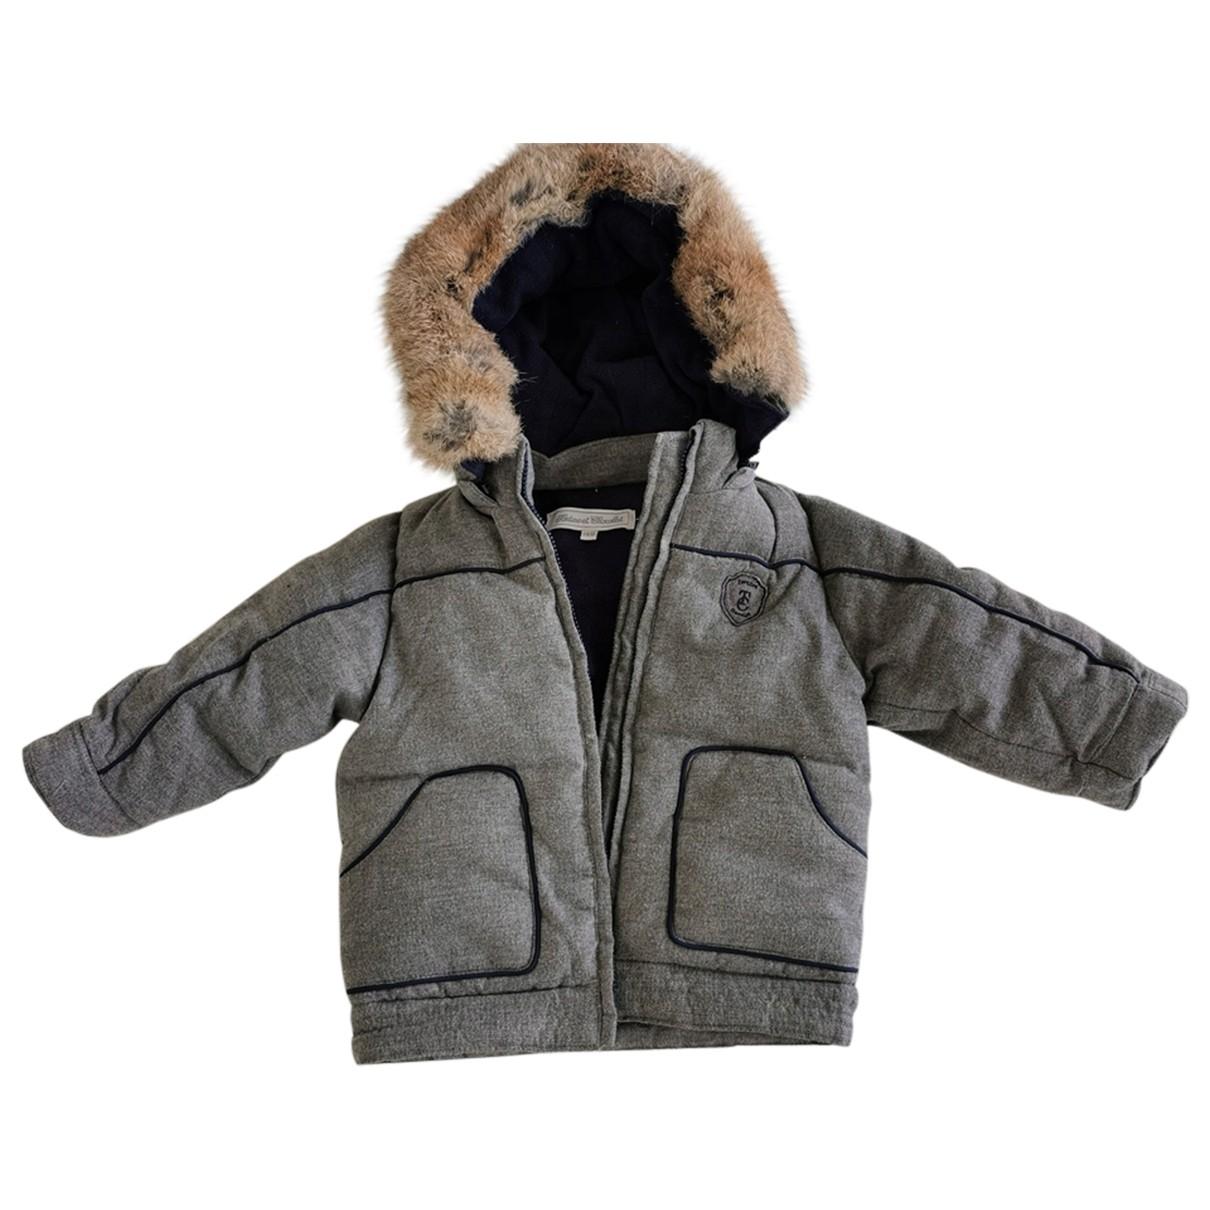 Tartine Et Chocolat \N Grey jacket & coat for Kids 18 months - up to 81cm FR